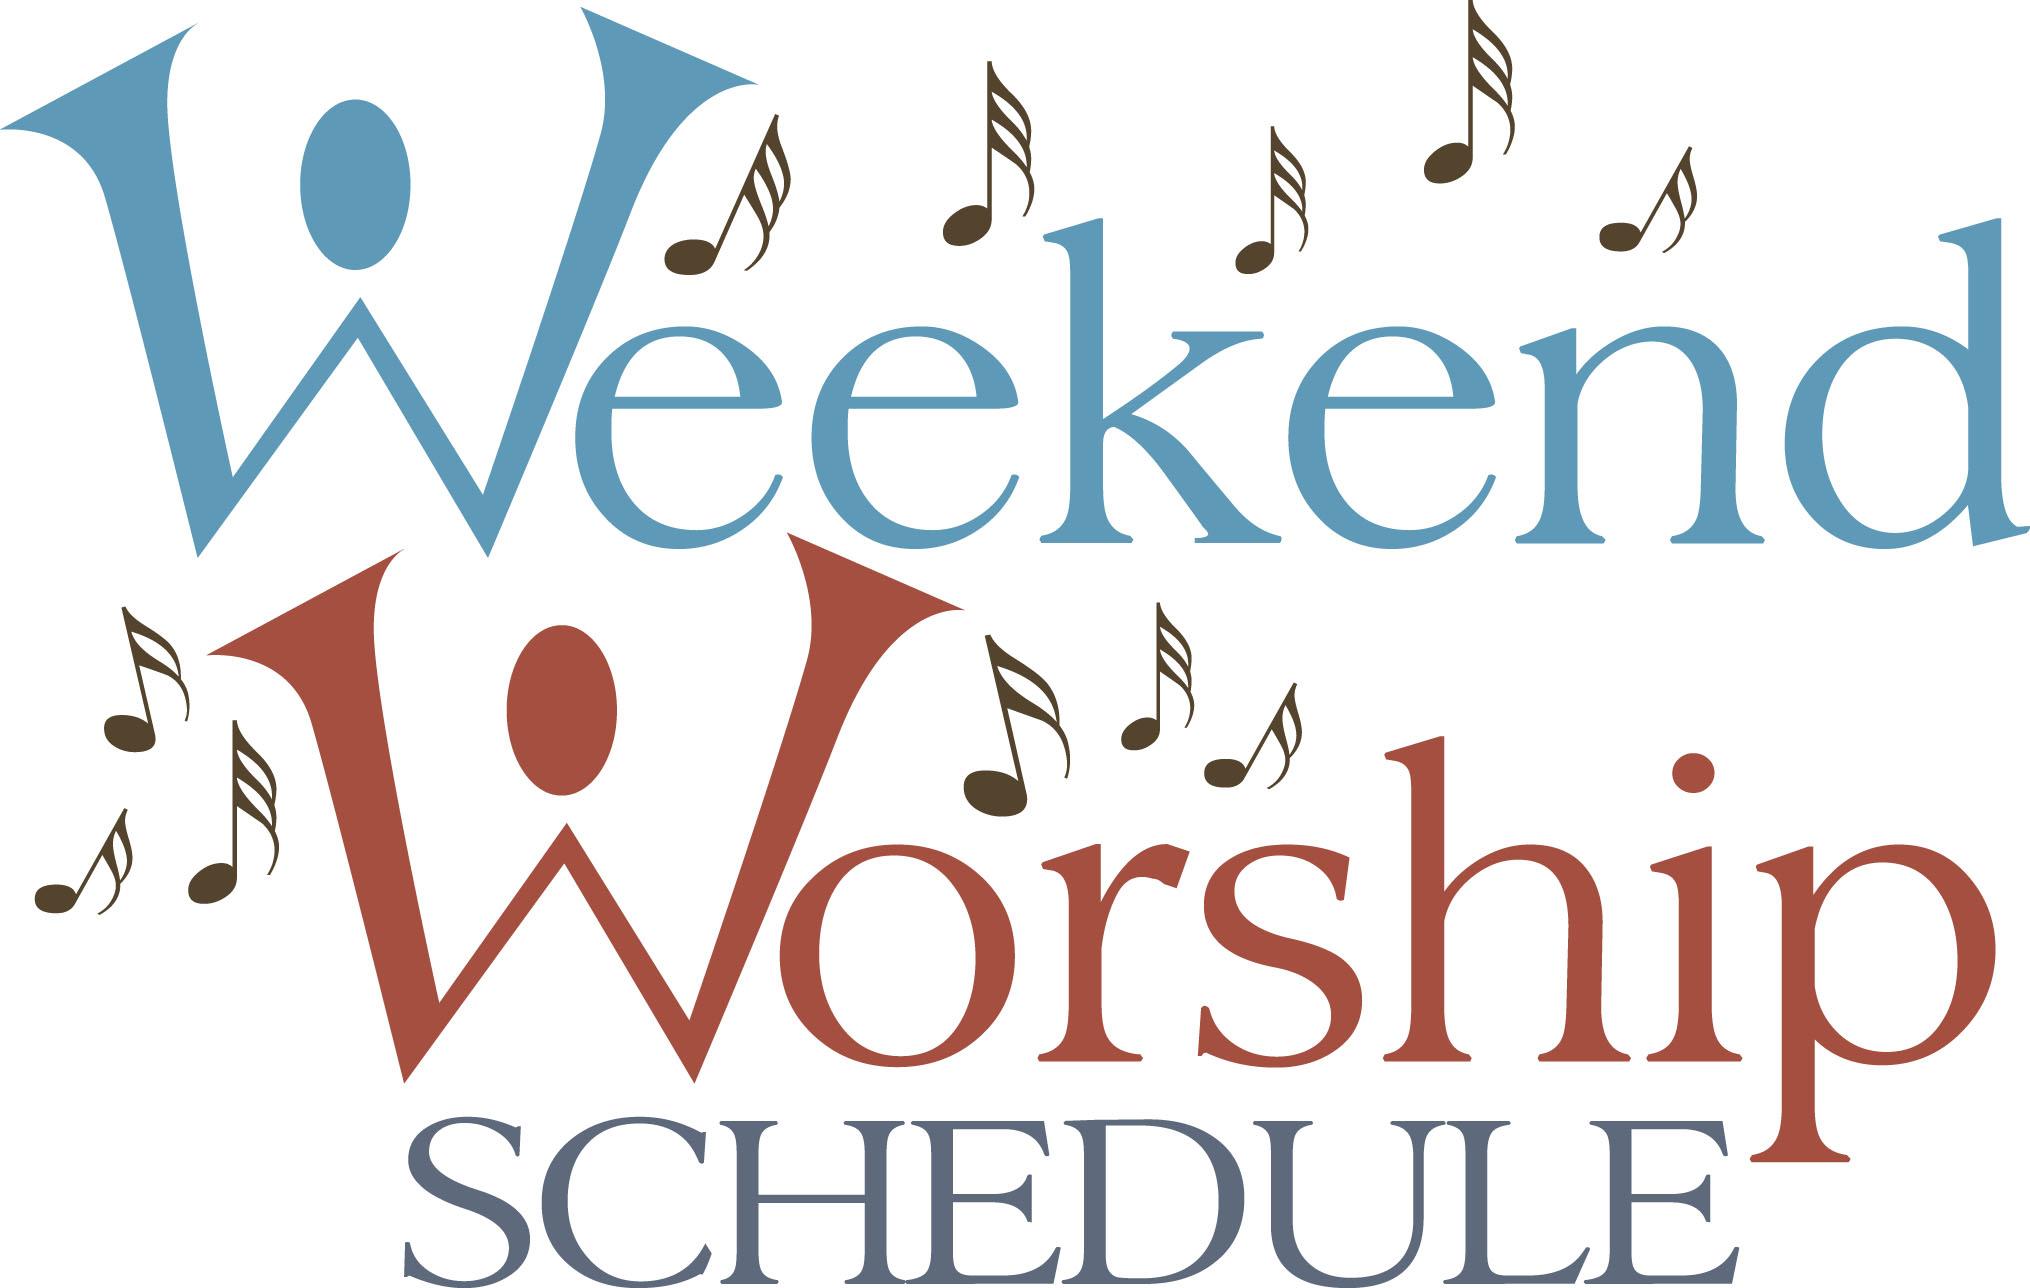 Weekend Worship Schedule